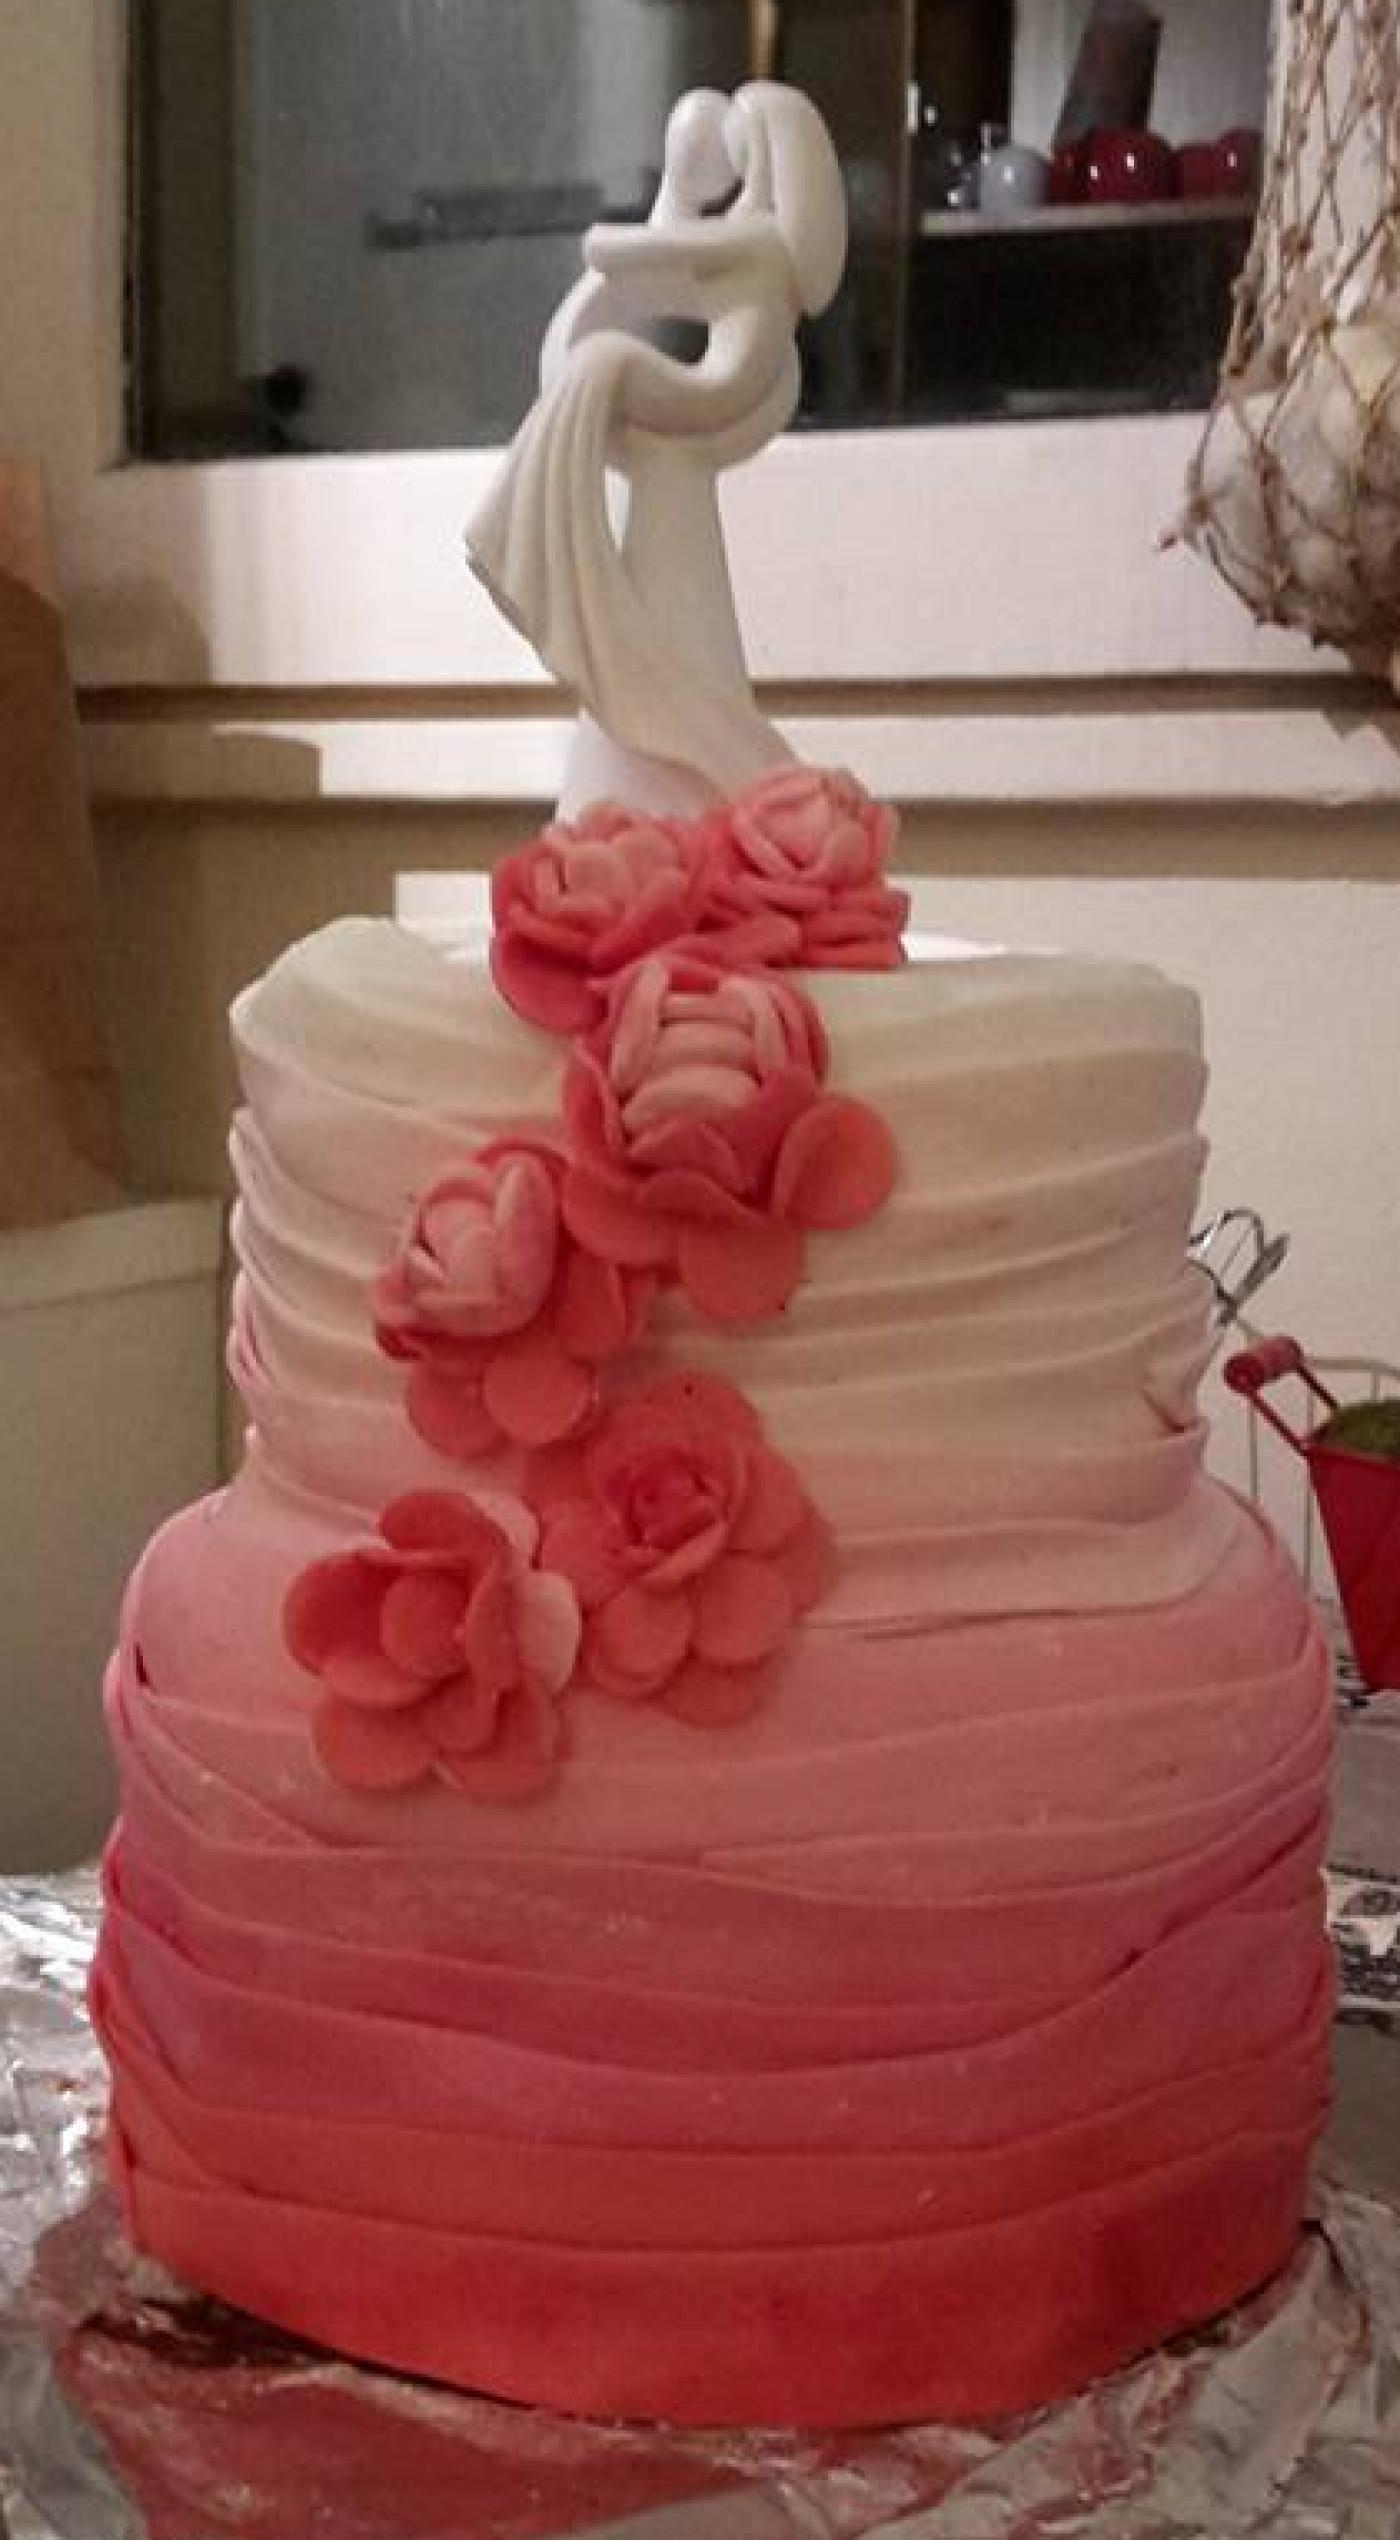 Preparatif de mon wedding cake